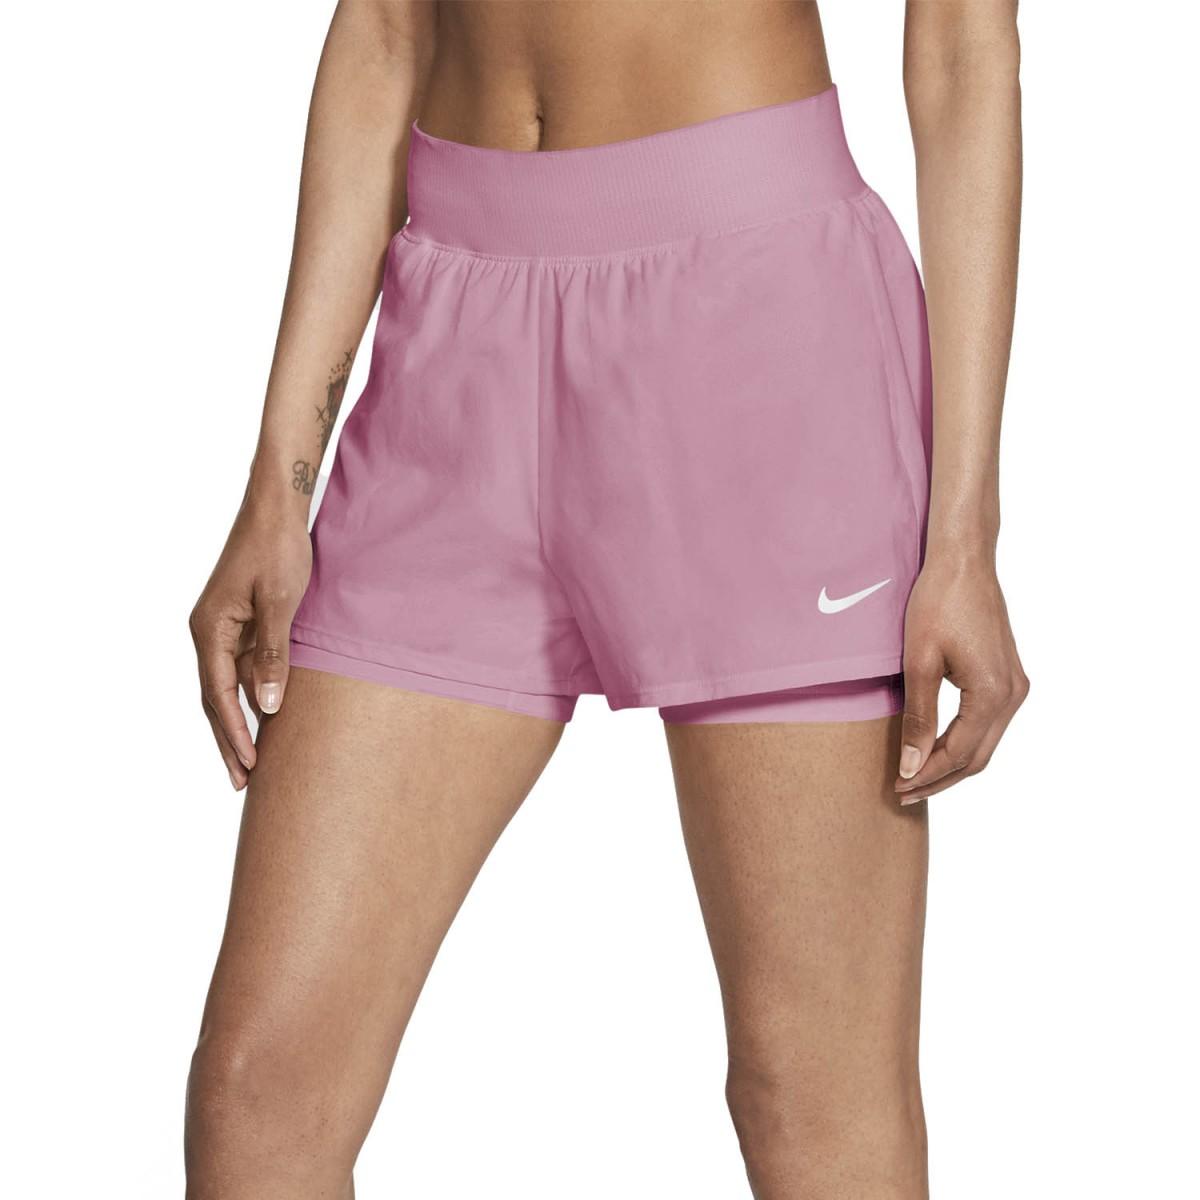 Теннисные шорты женские Nike Court Victory Short elemental pink/white